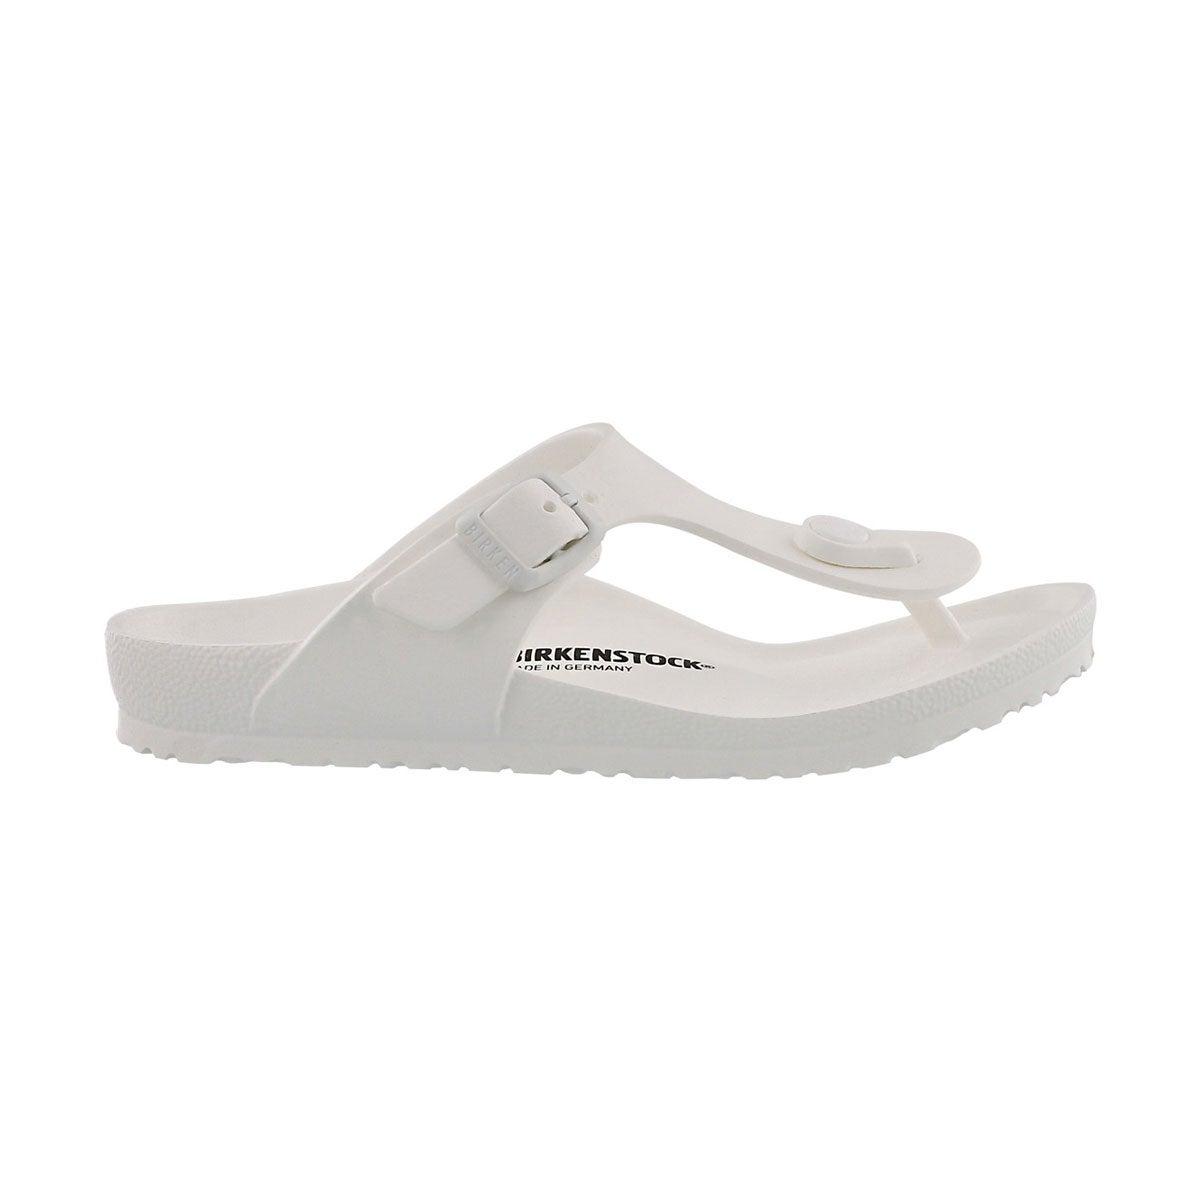 Sandale tong GIZEH EVA, blanc, filles